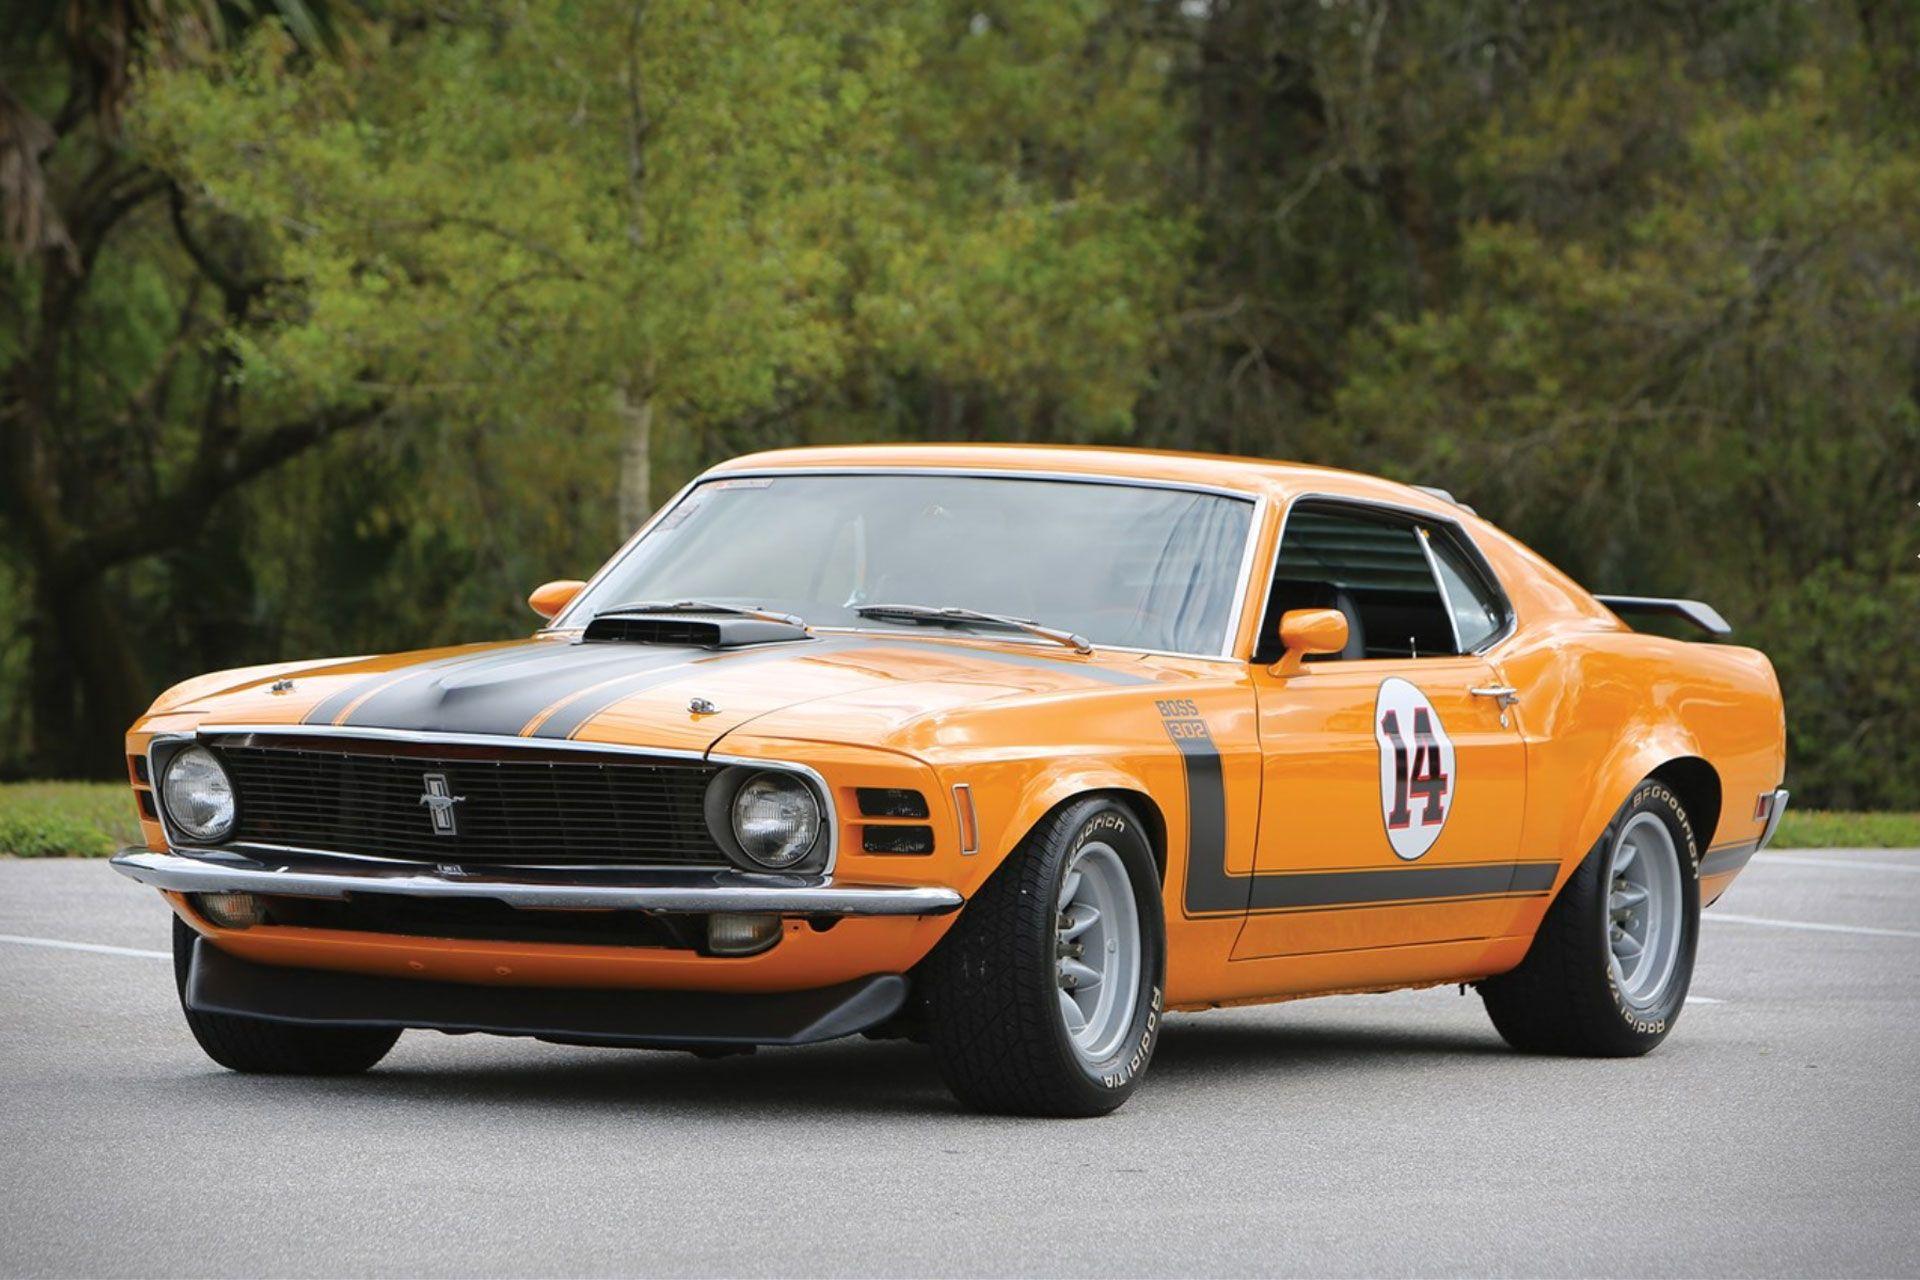 1970 Ford Mustang Boss 302 Ford Mustang Boss Ford Mustang Boss 302 Mustang Boss